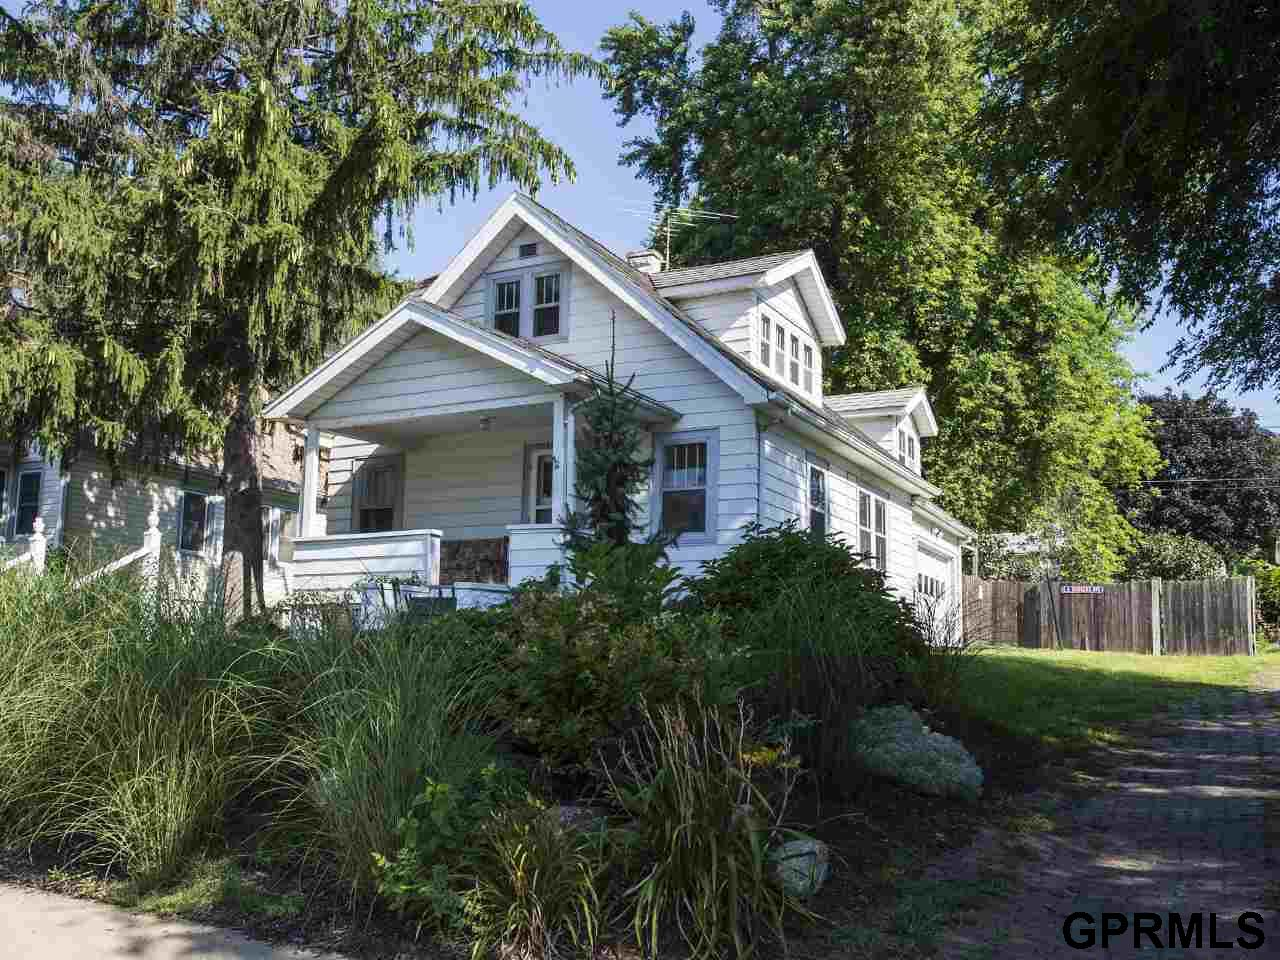 Rental Homes for Rent, ListingId:35191674, location: 5824 Dorcas Omaha 68106